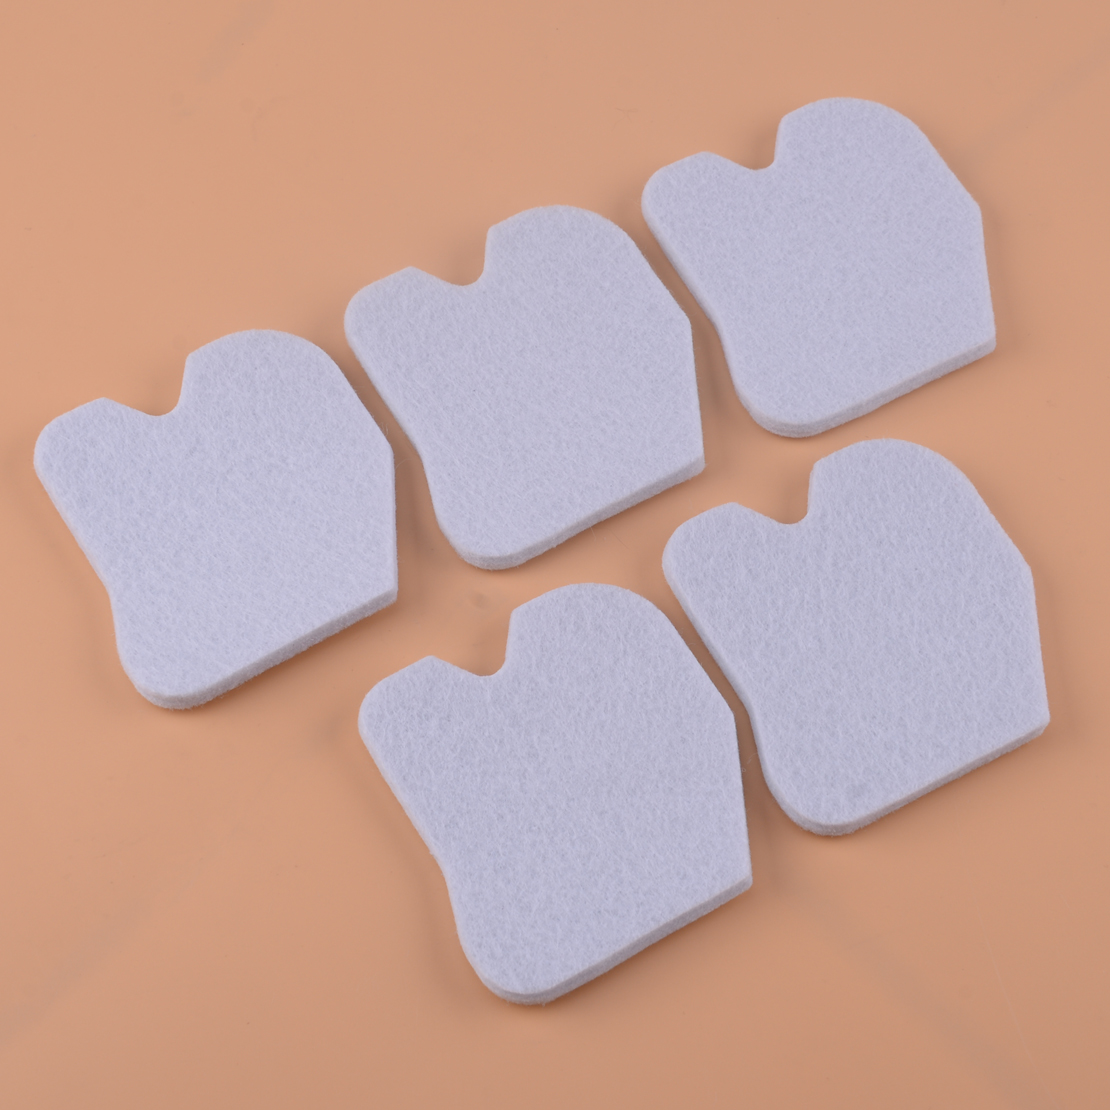 LETAOSK 5PCS White Cotton Air Filter 545061801 Fit For Husqvarna 235 235E 236 236E 240 240E Chainsaw